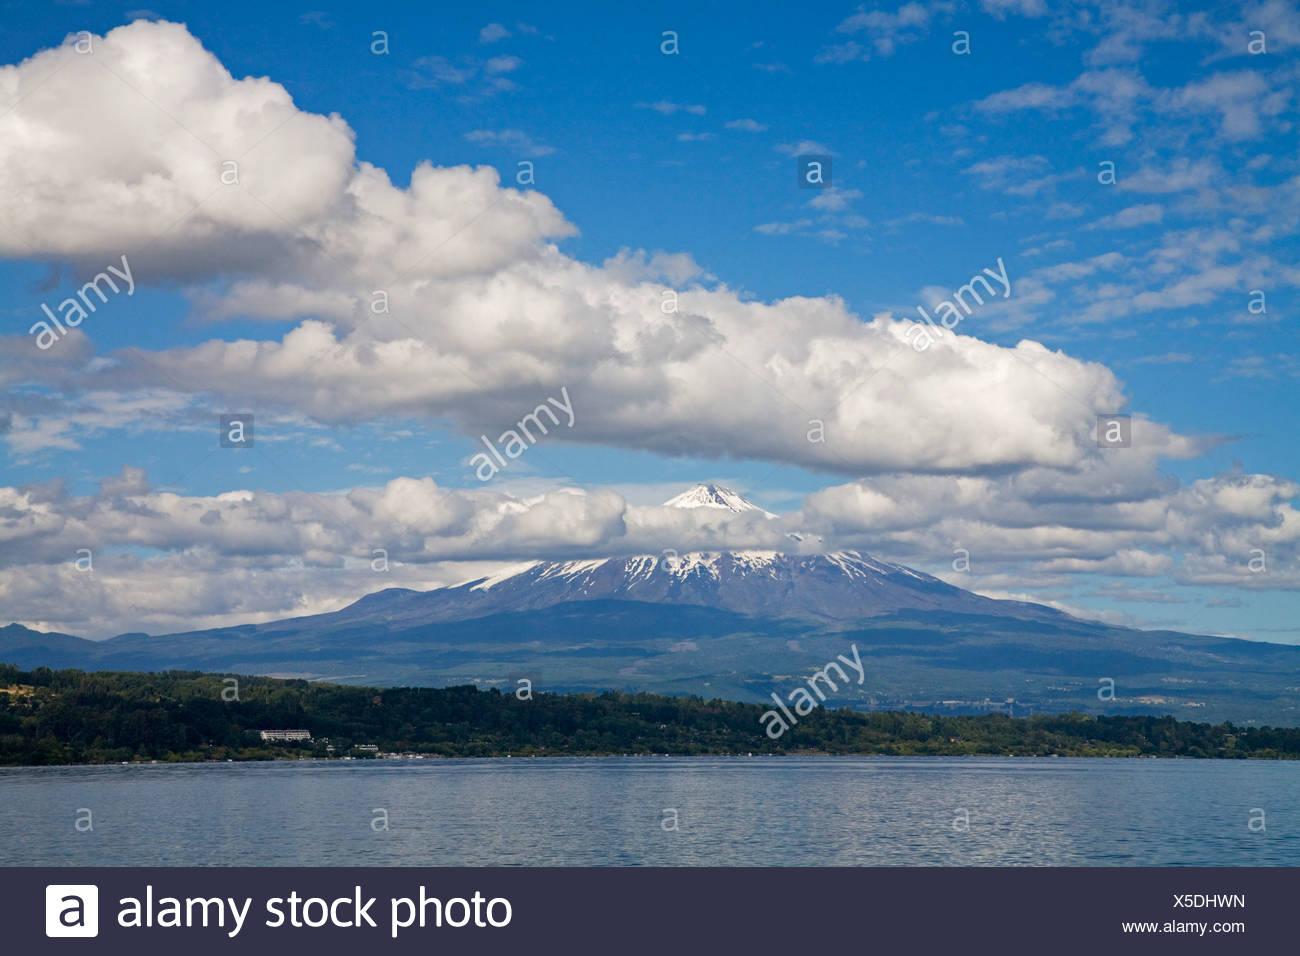 Vulcano Villarrica at the lake Lago Villarrica, Chile, South America - Stock Image